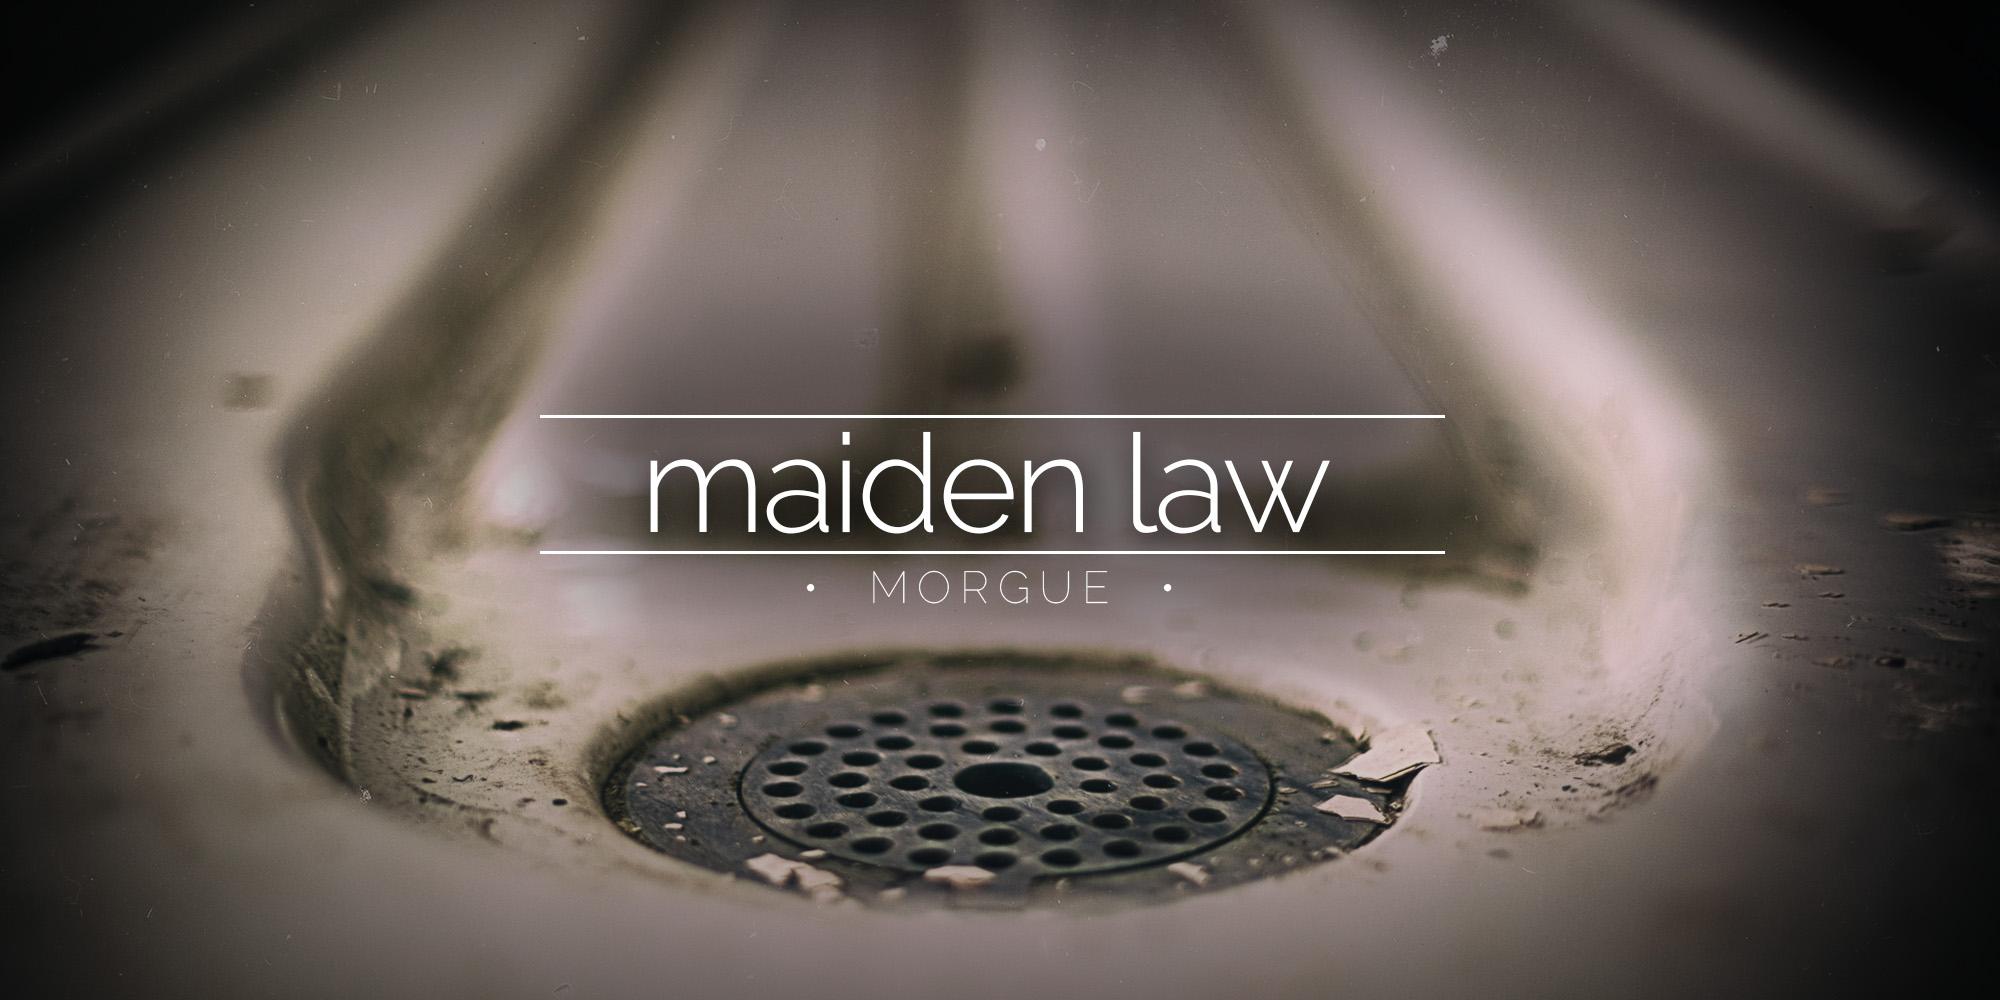 The Maids Morgue - Abandoned Mortuary